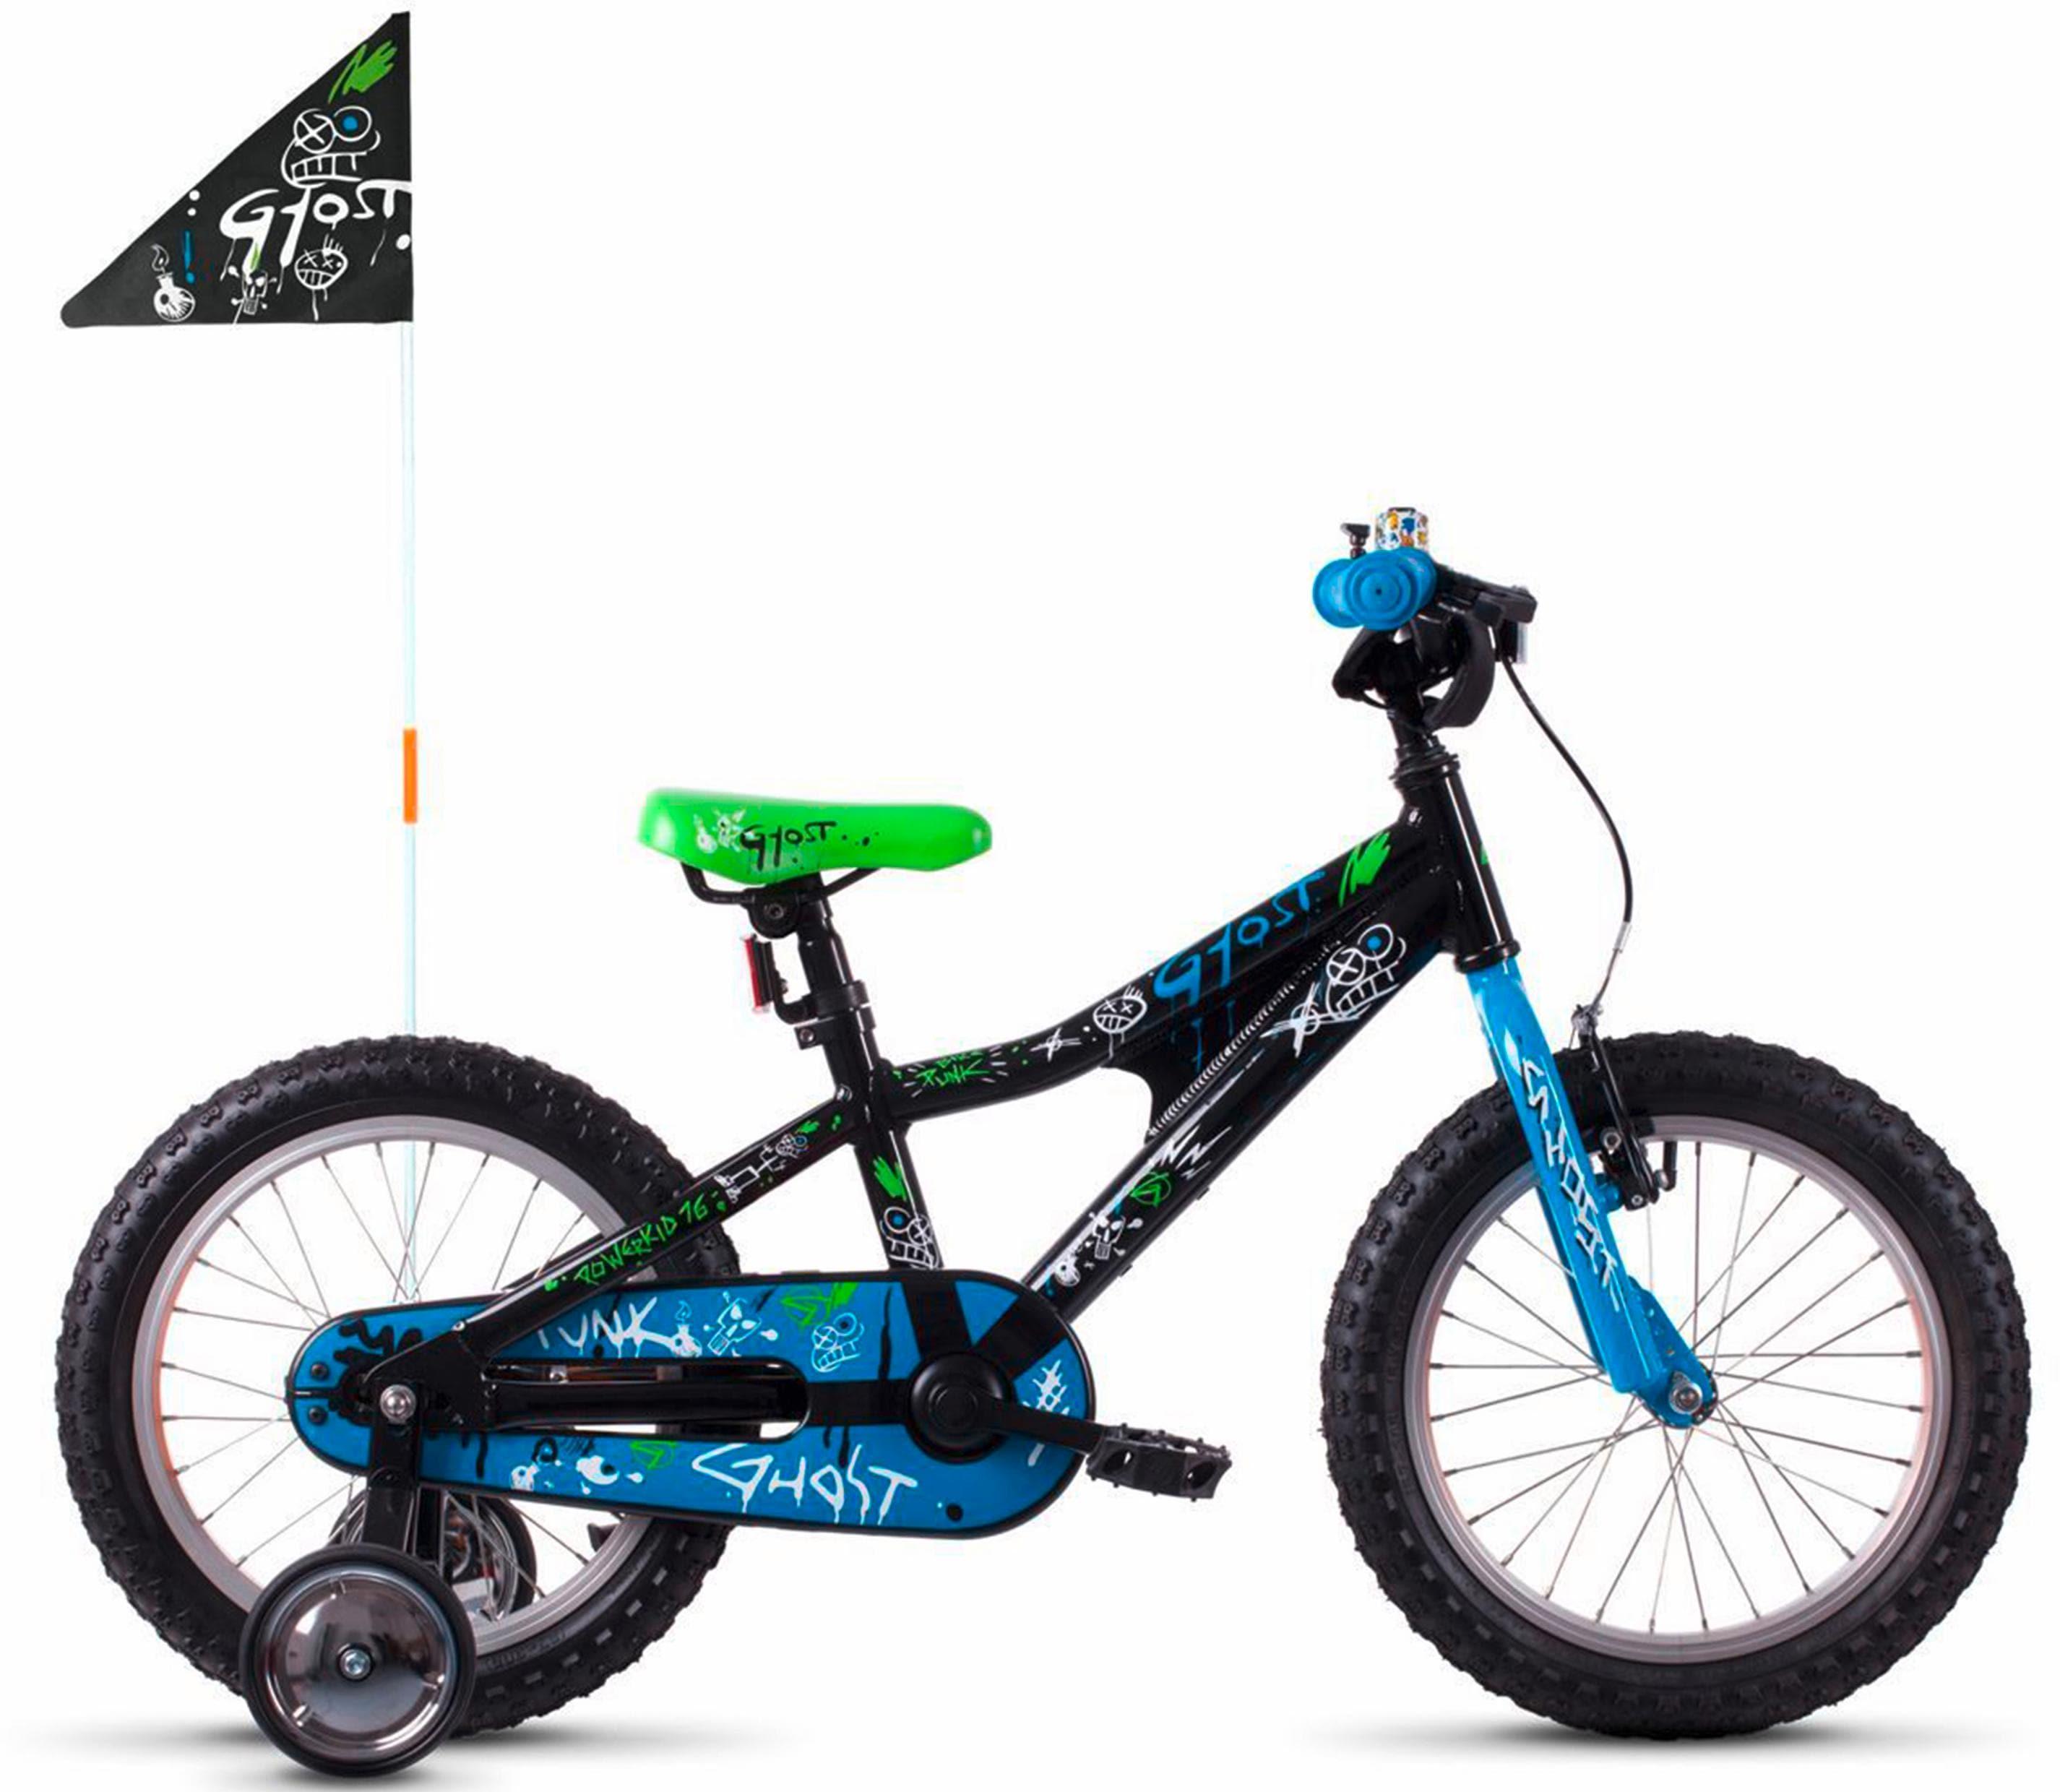 Ghost Kinderfahrrad POWERKID AL 16 K schwarz Kinder Kinderfahrräder Fahrräder Zubehör Fahrrad